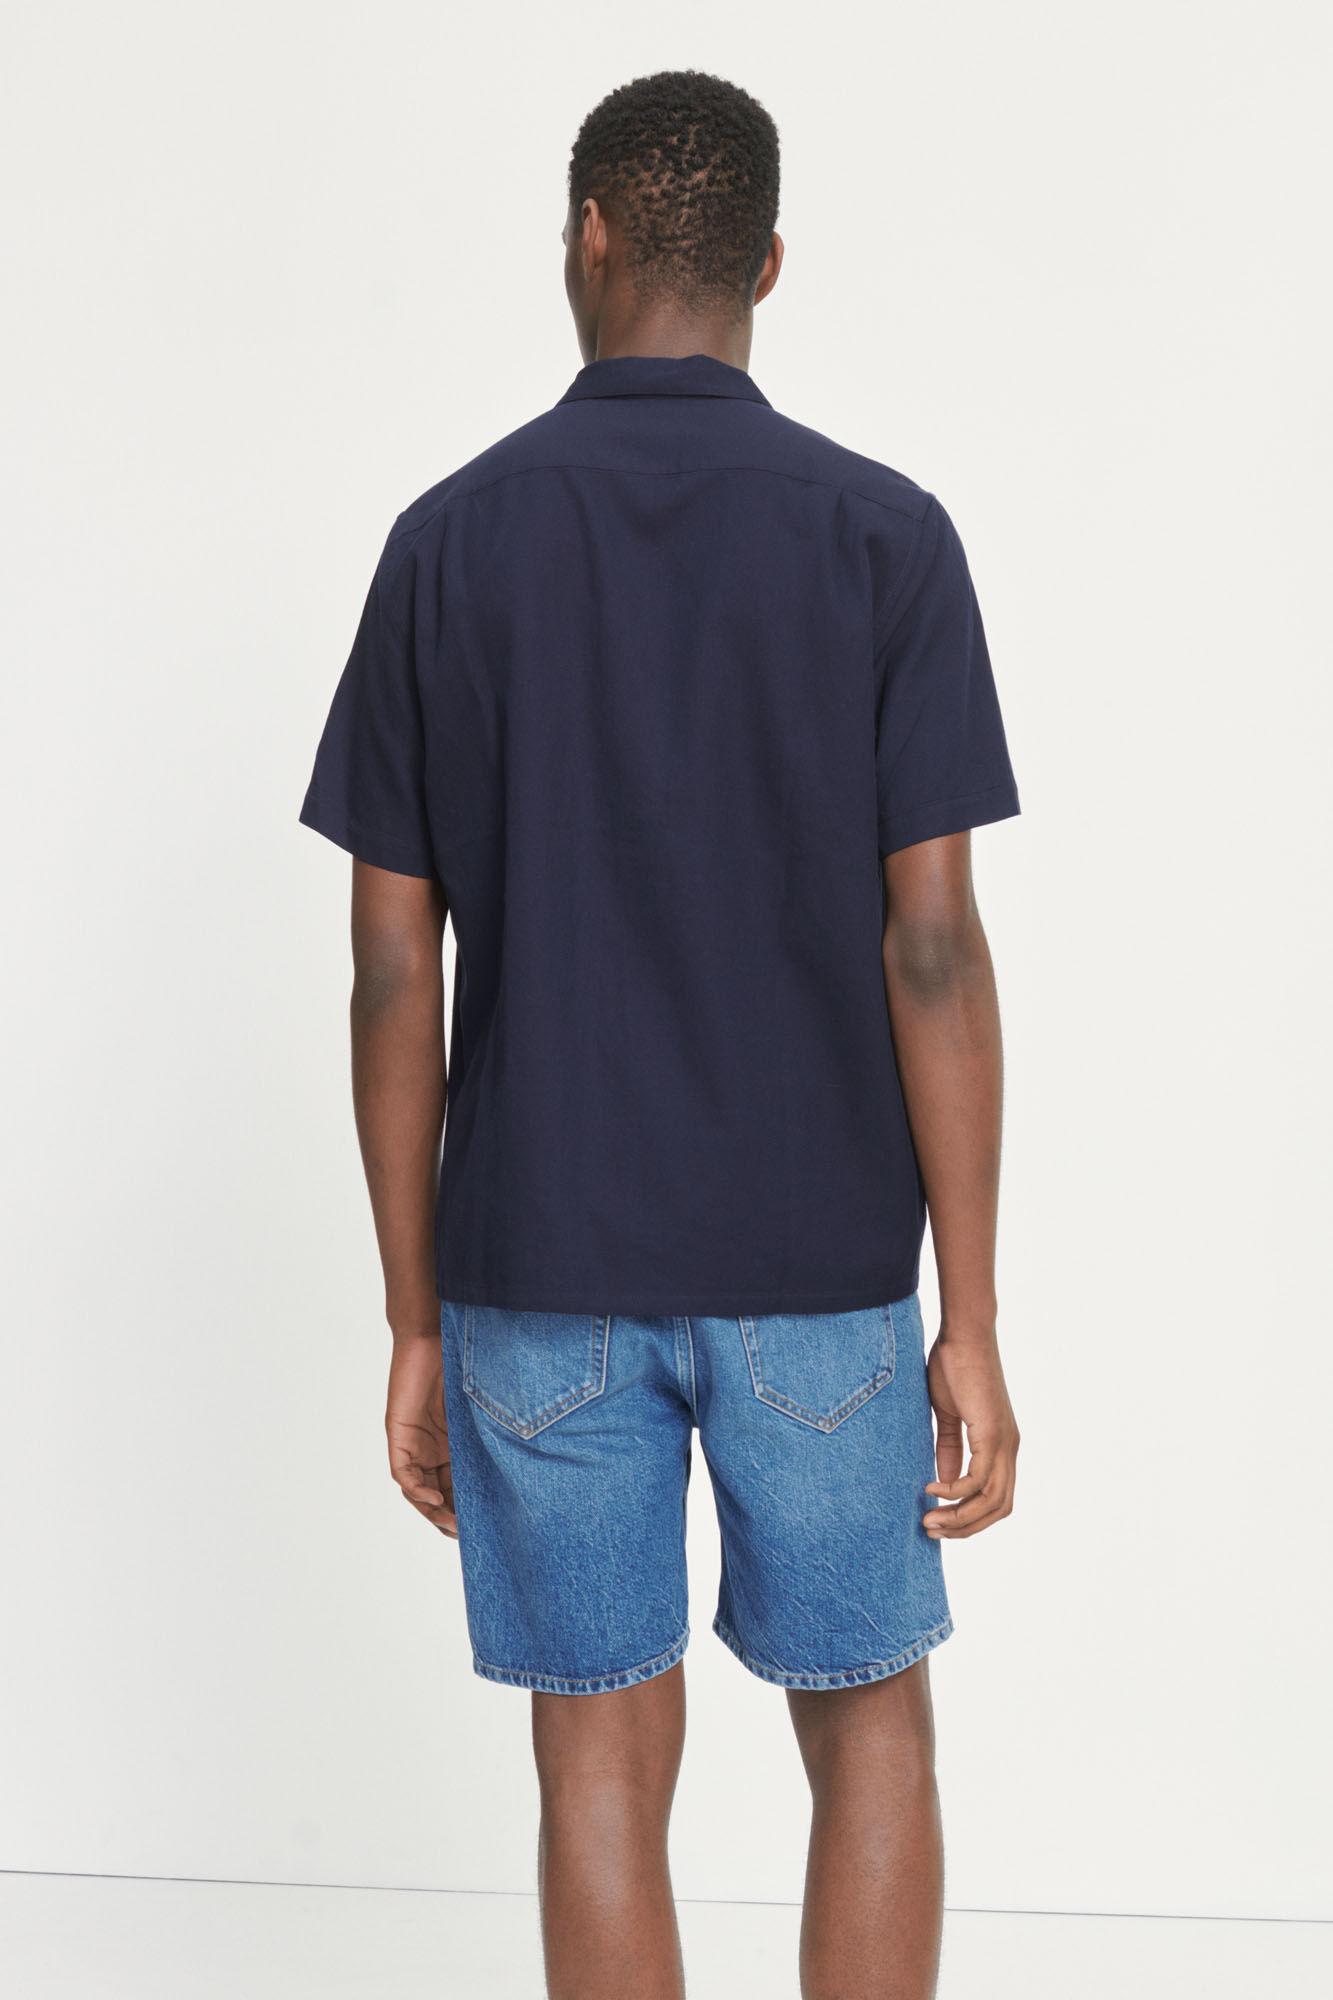 Avan JF shirt 11018